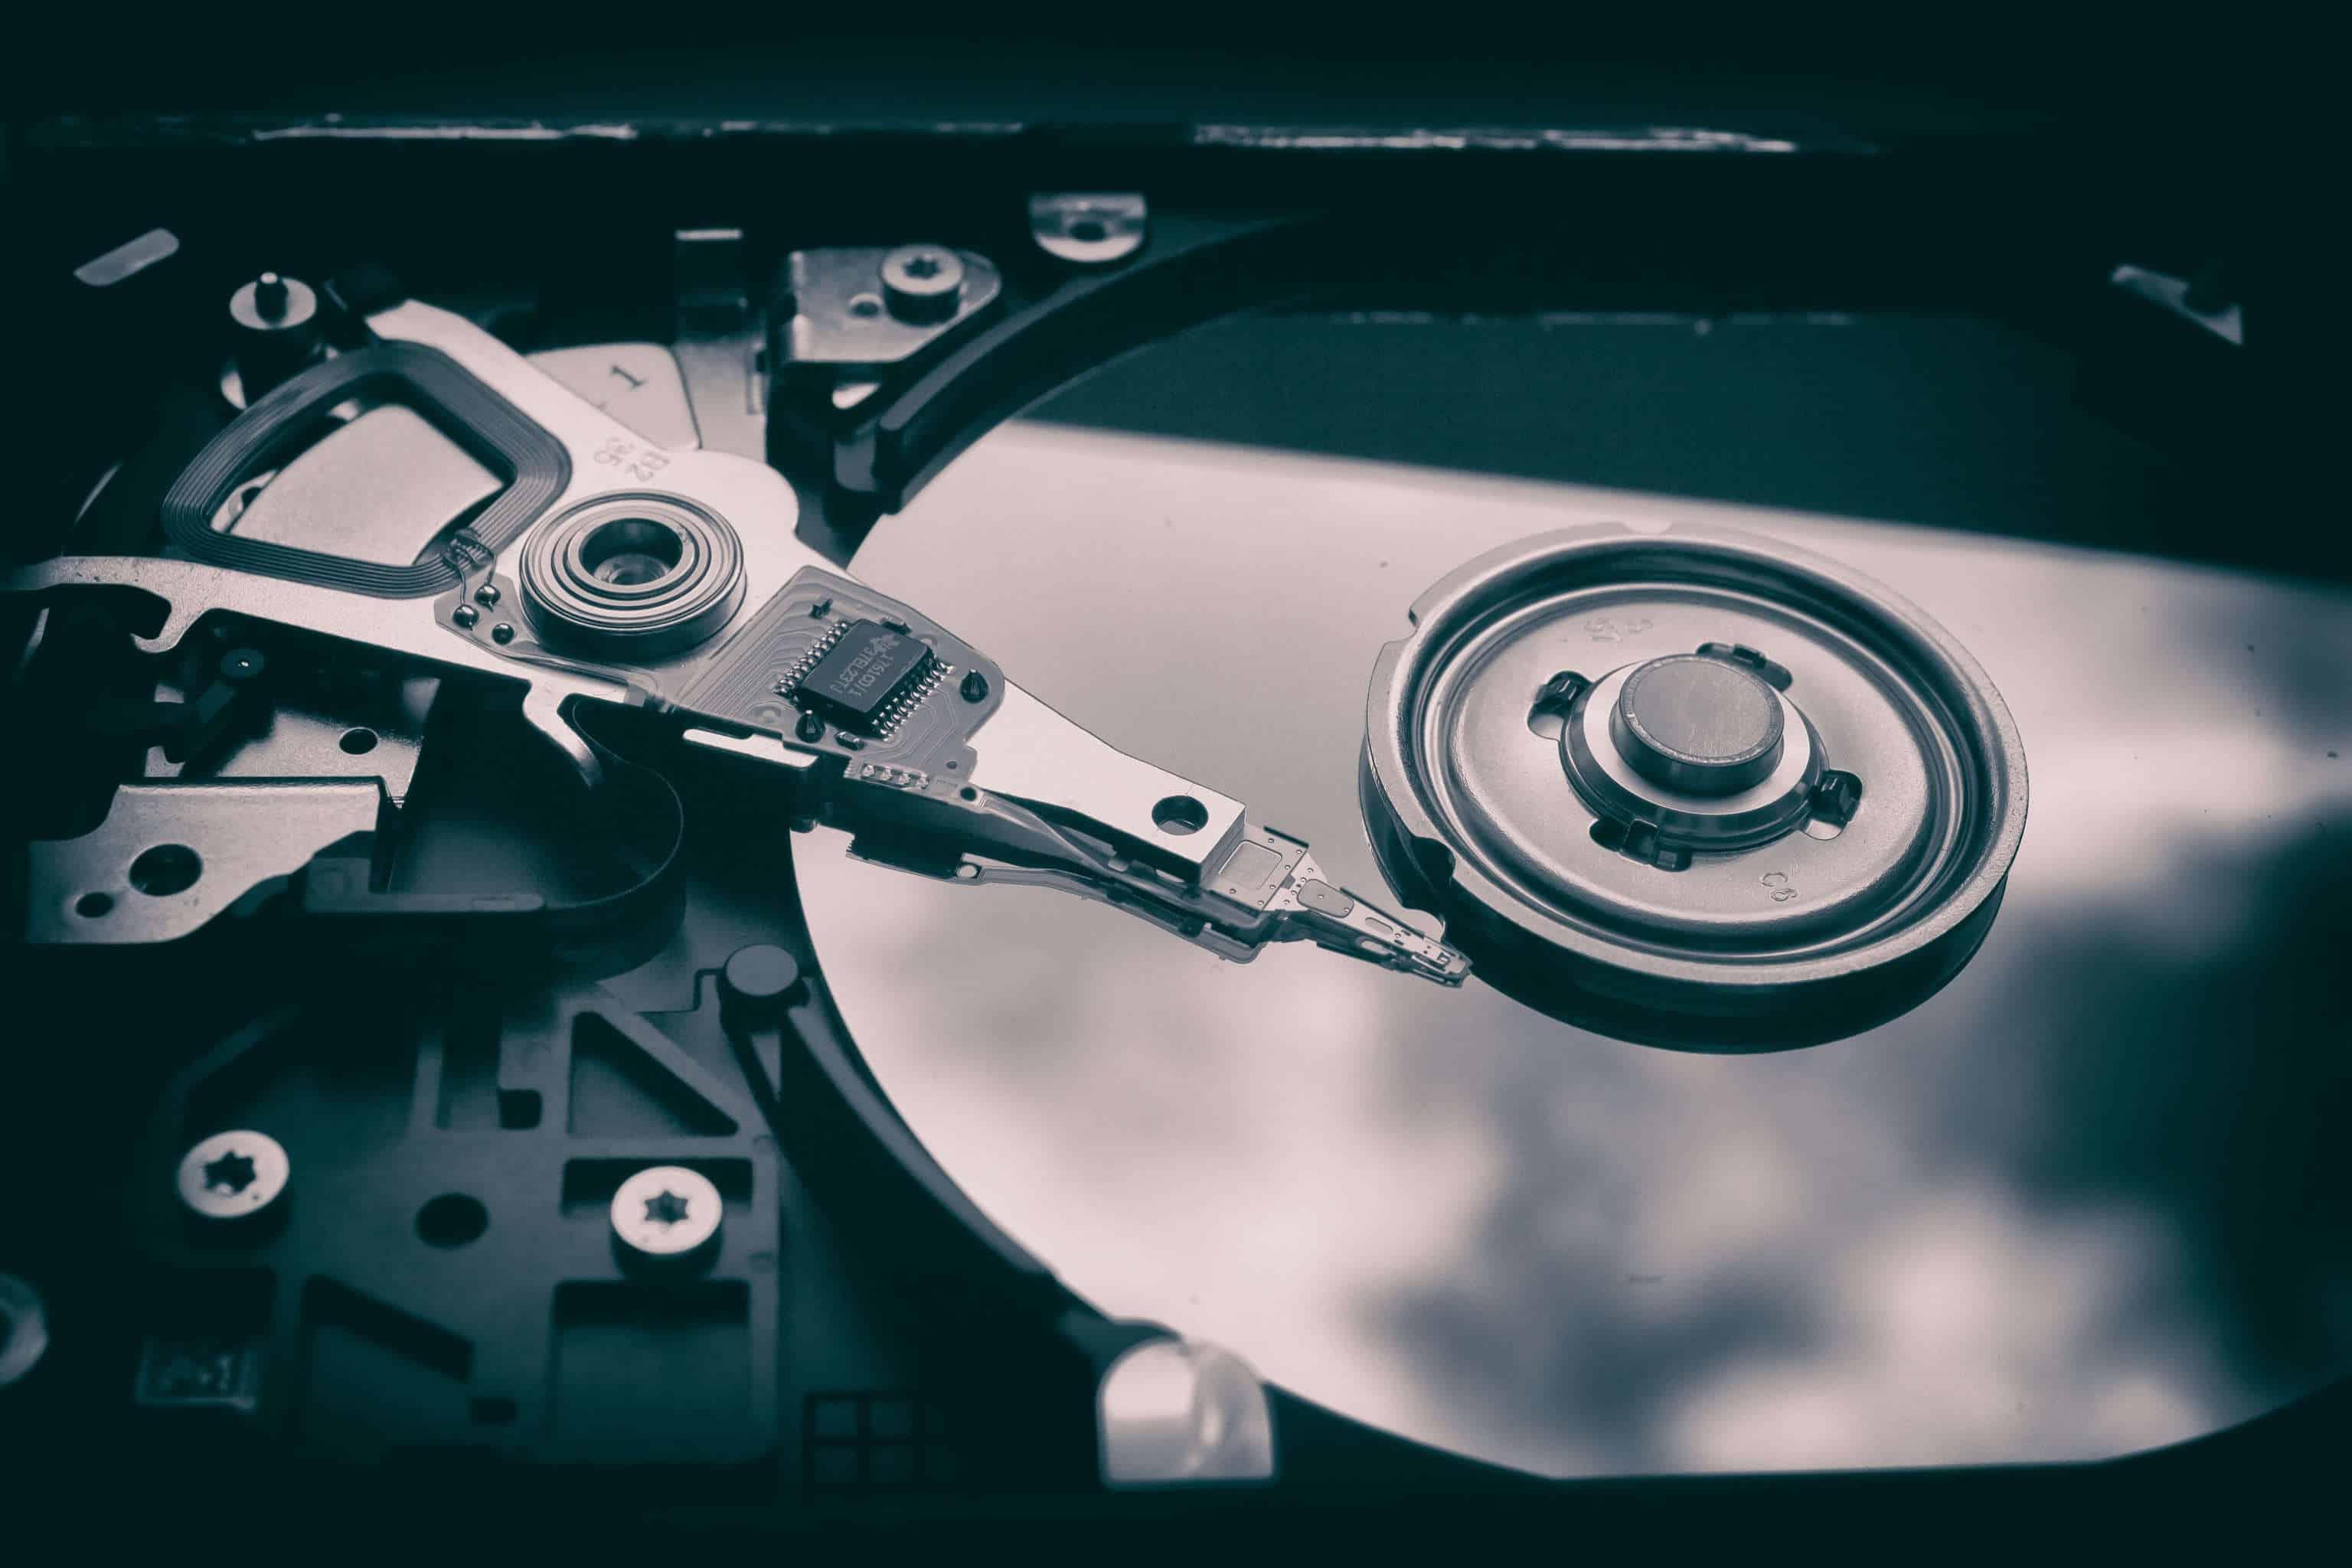 Hard Drive / Festplatte eines Computers